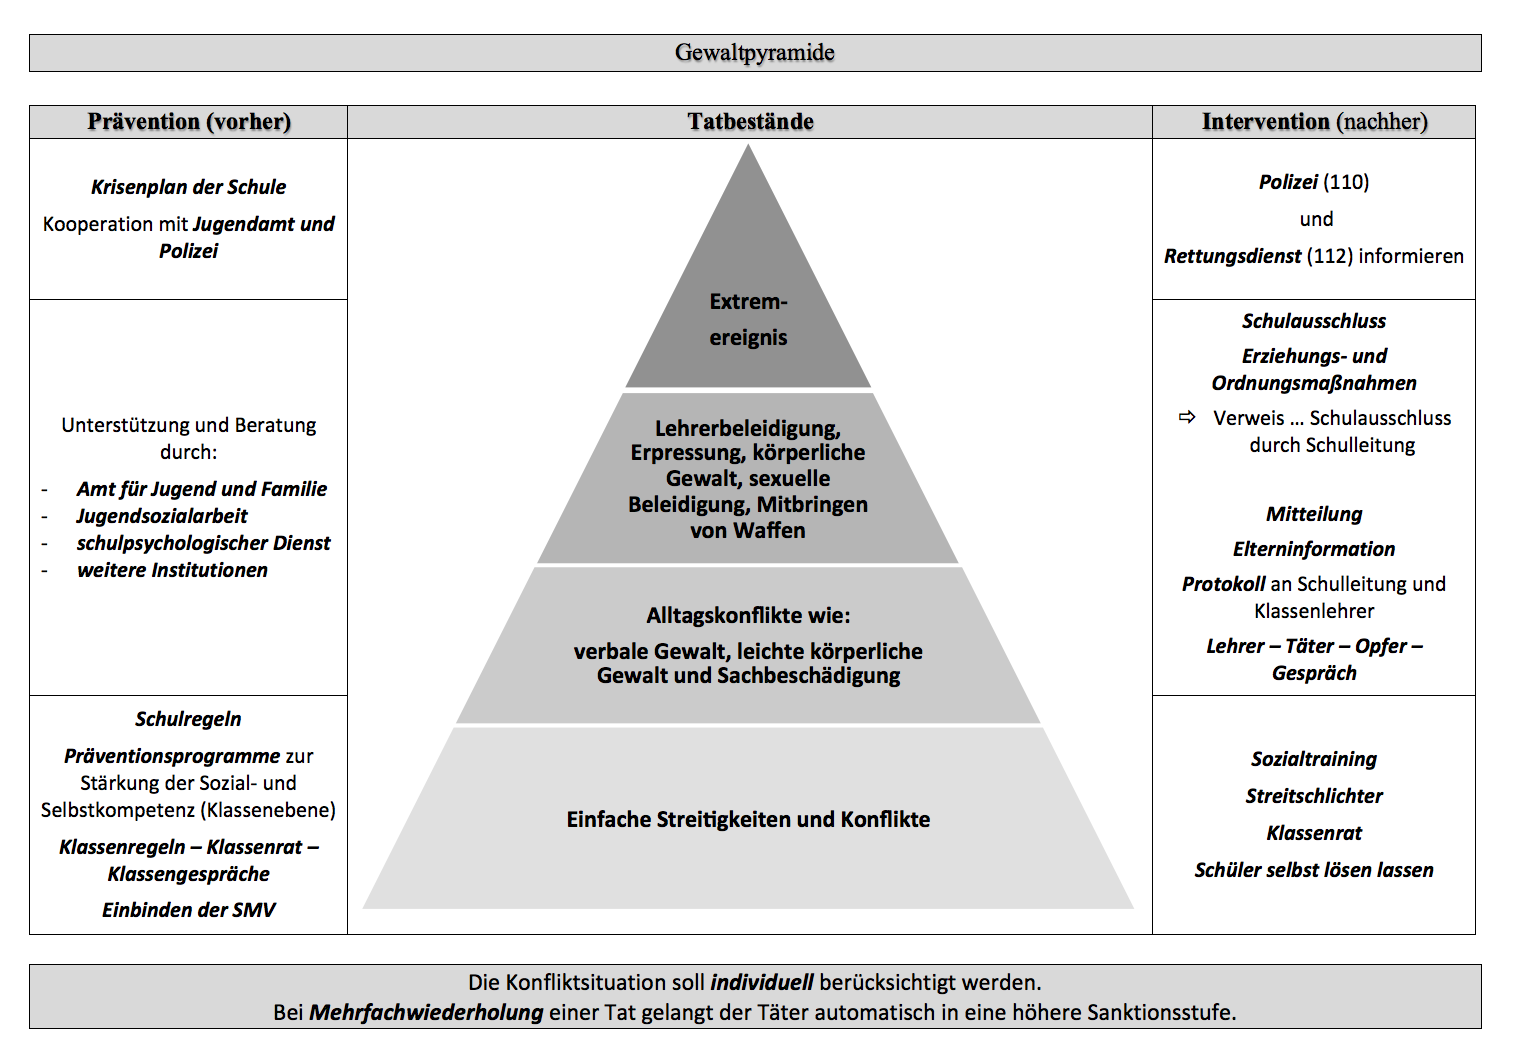 Gewaltpyramide